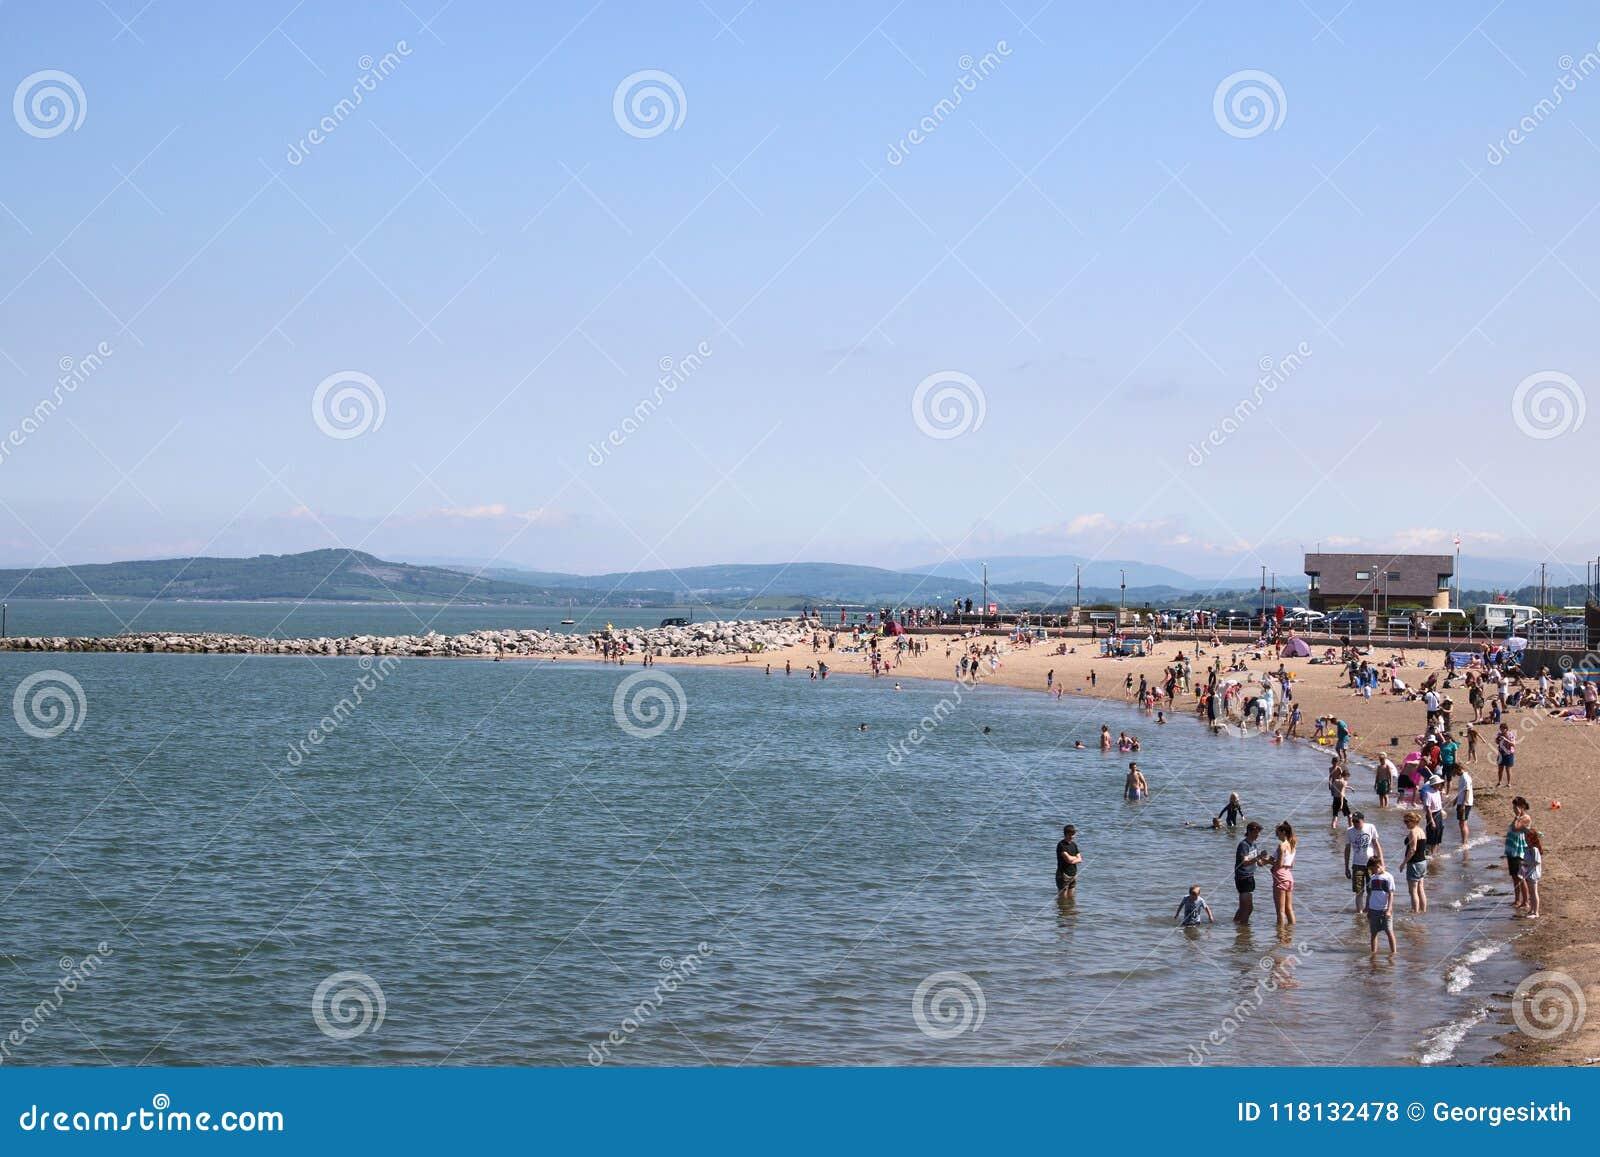 People on beach, sunny day, Morecambe, Lancashire